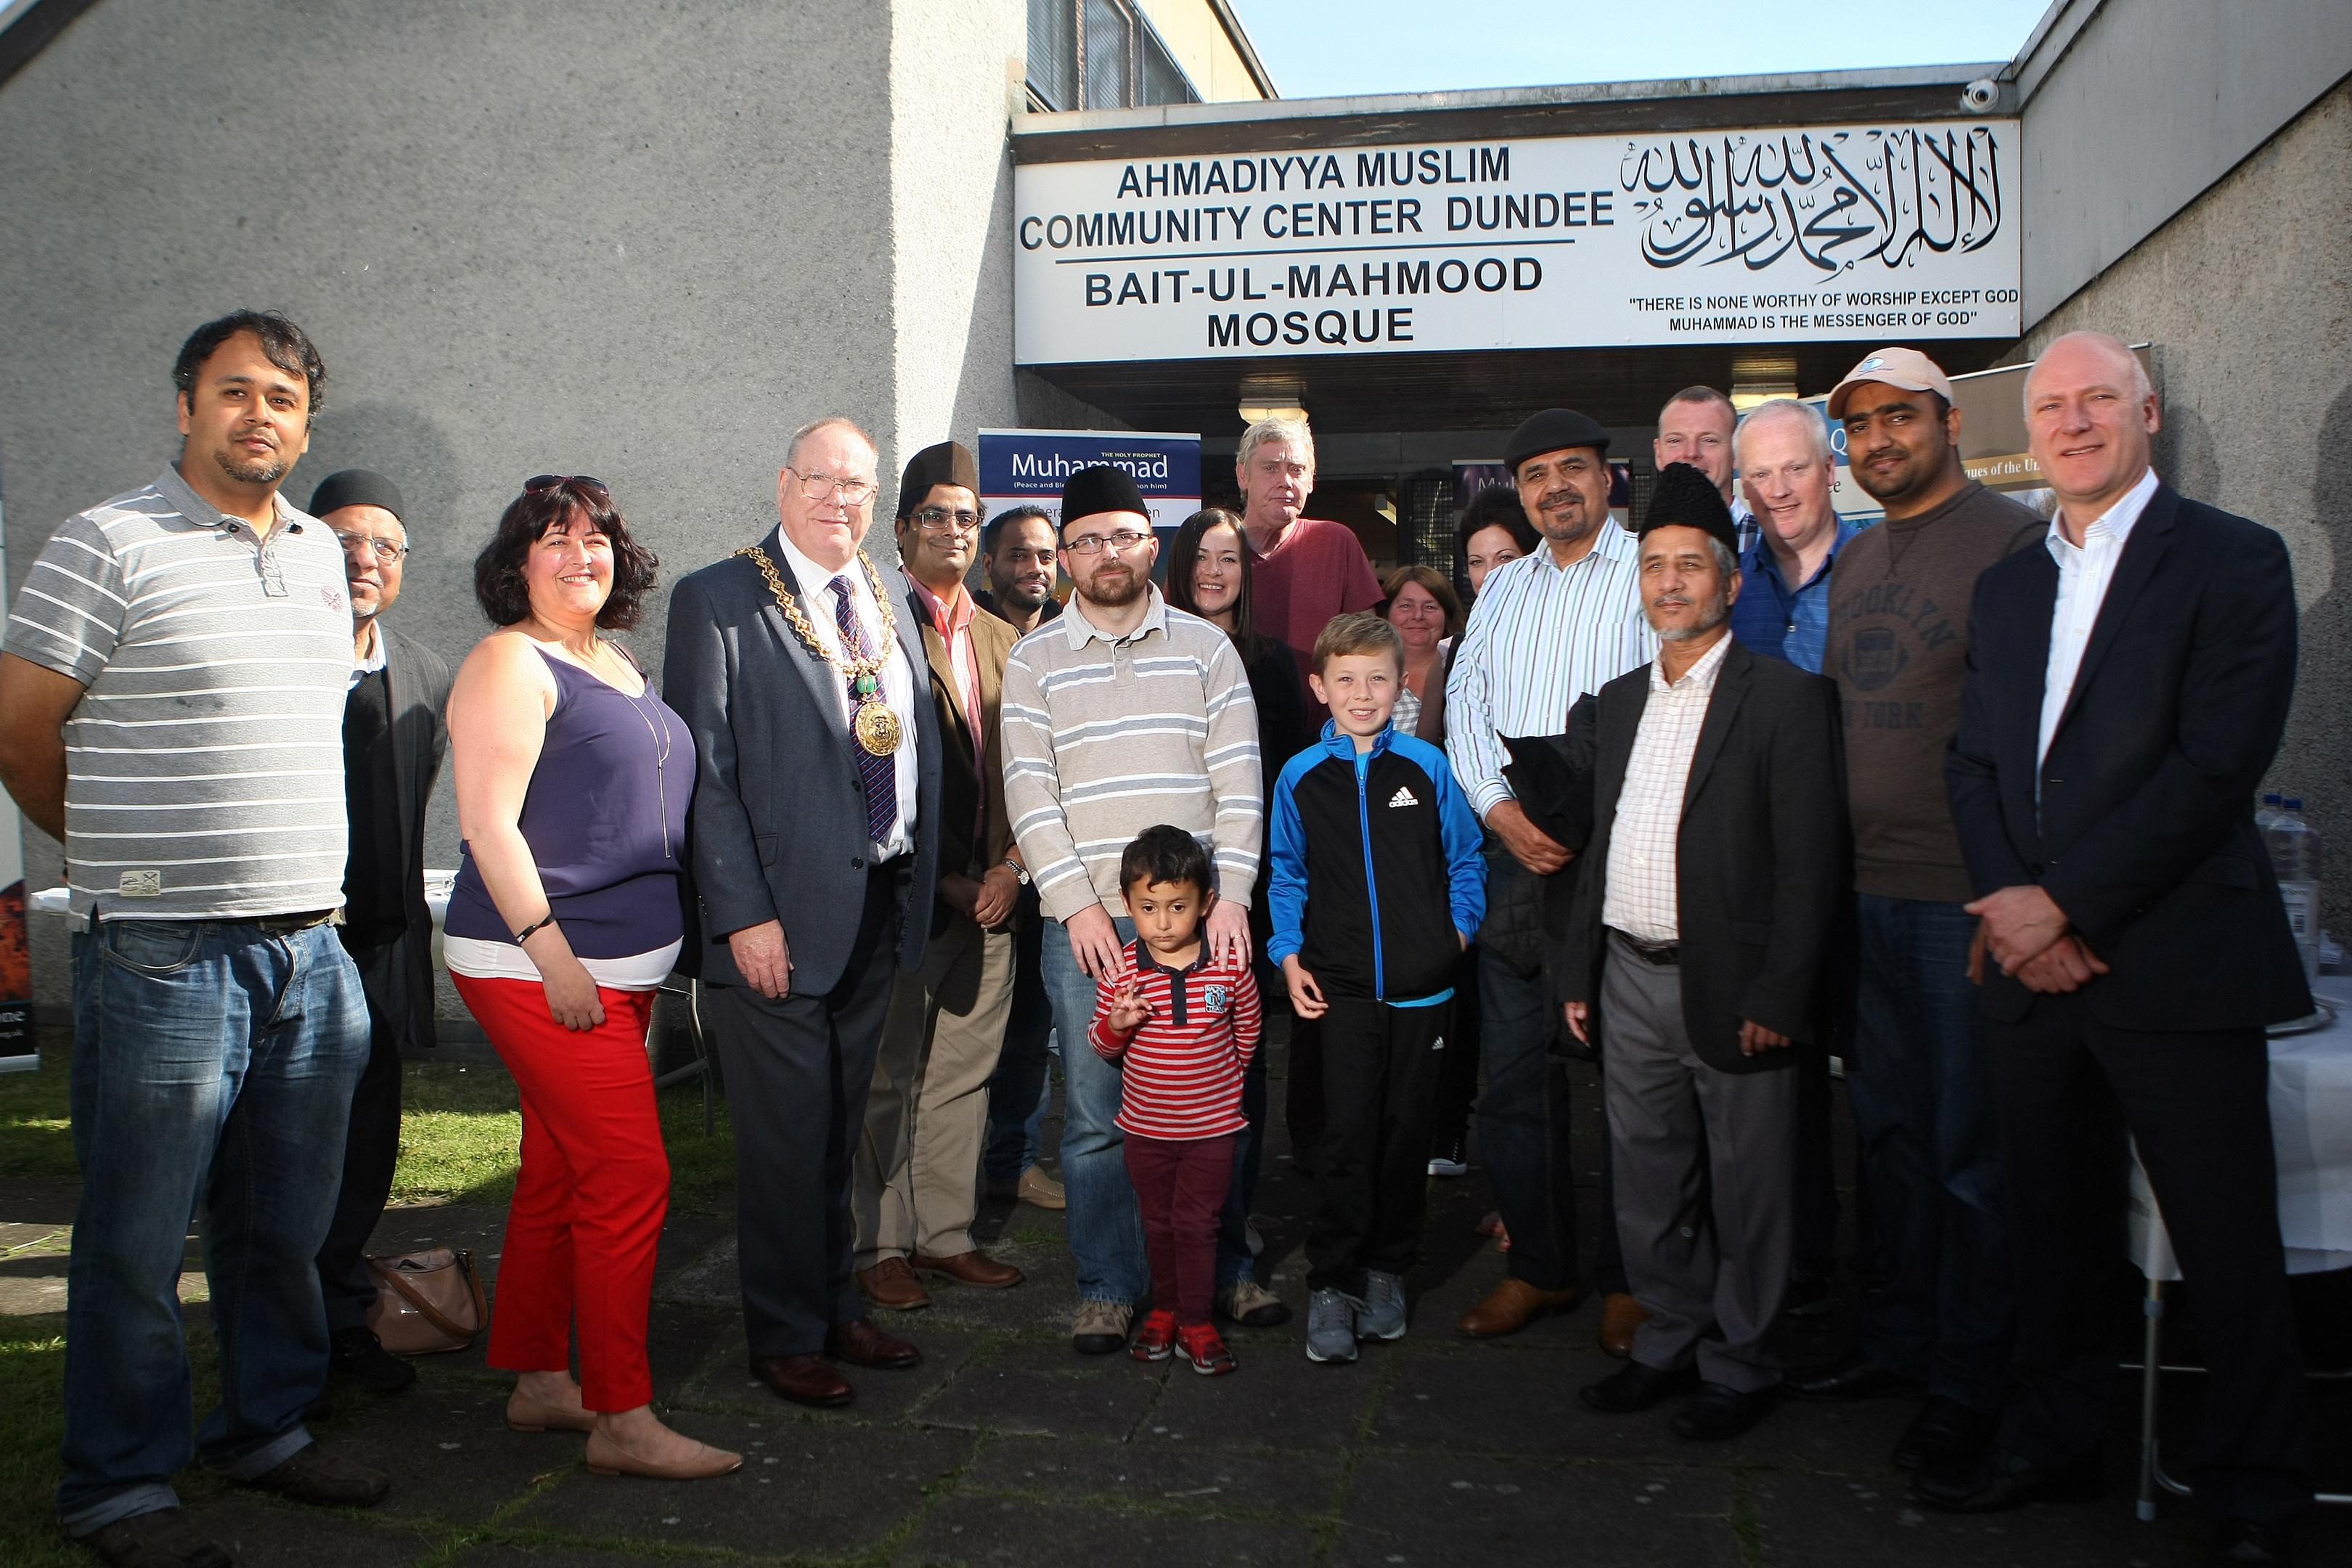 Dundee's Ahmadiyya Muslim community has called for unity after last week's atrocity in London